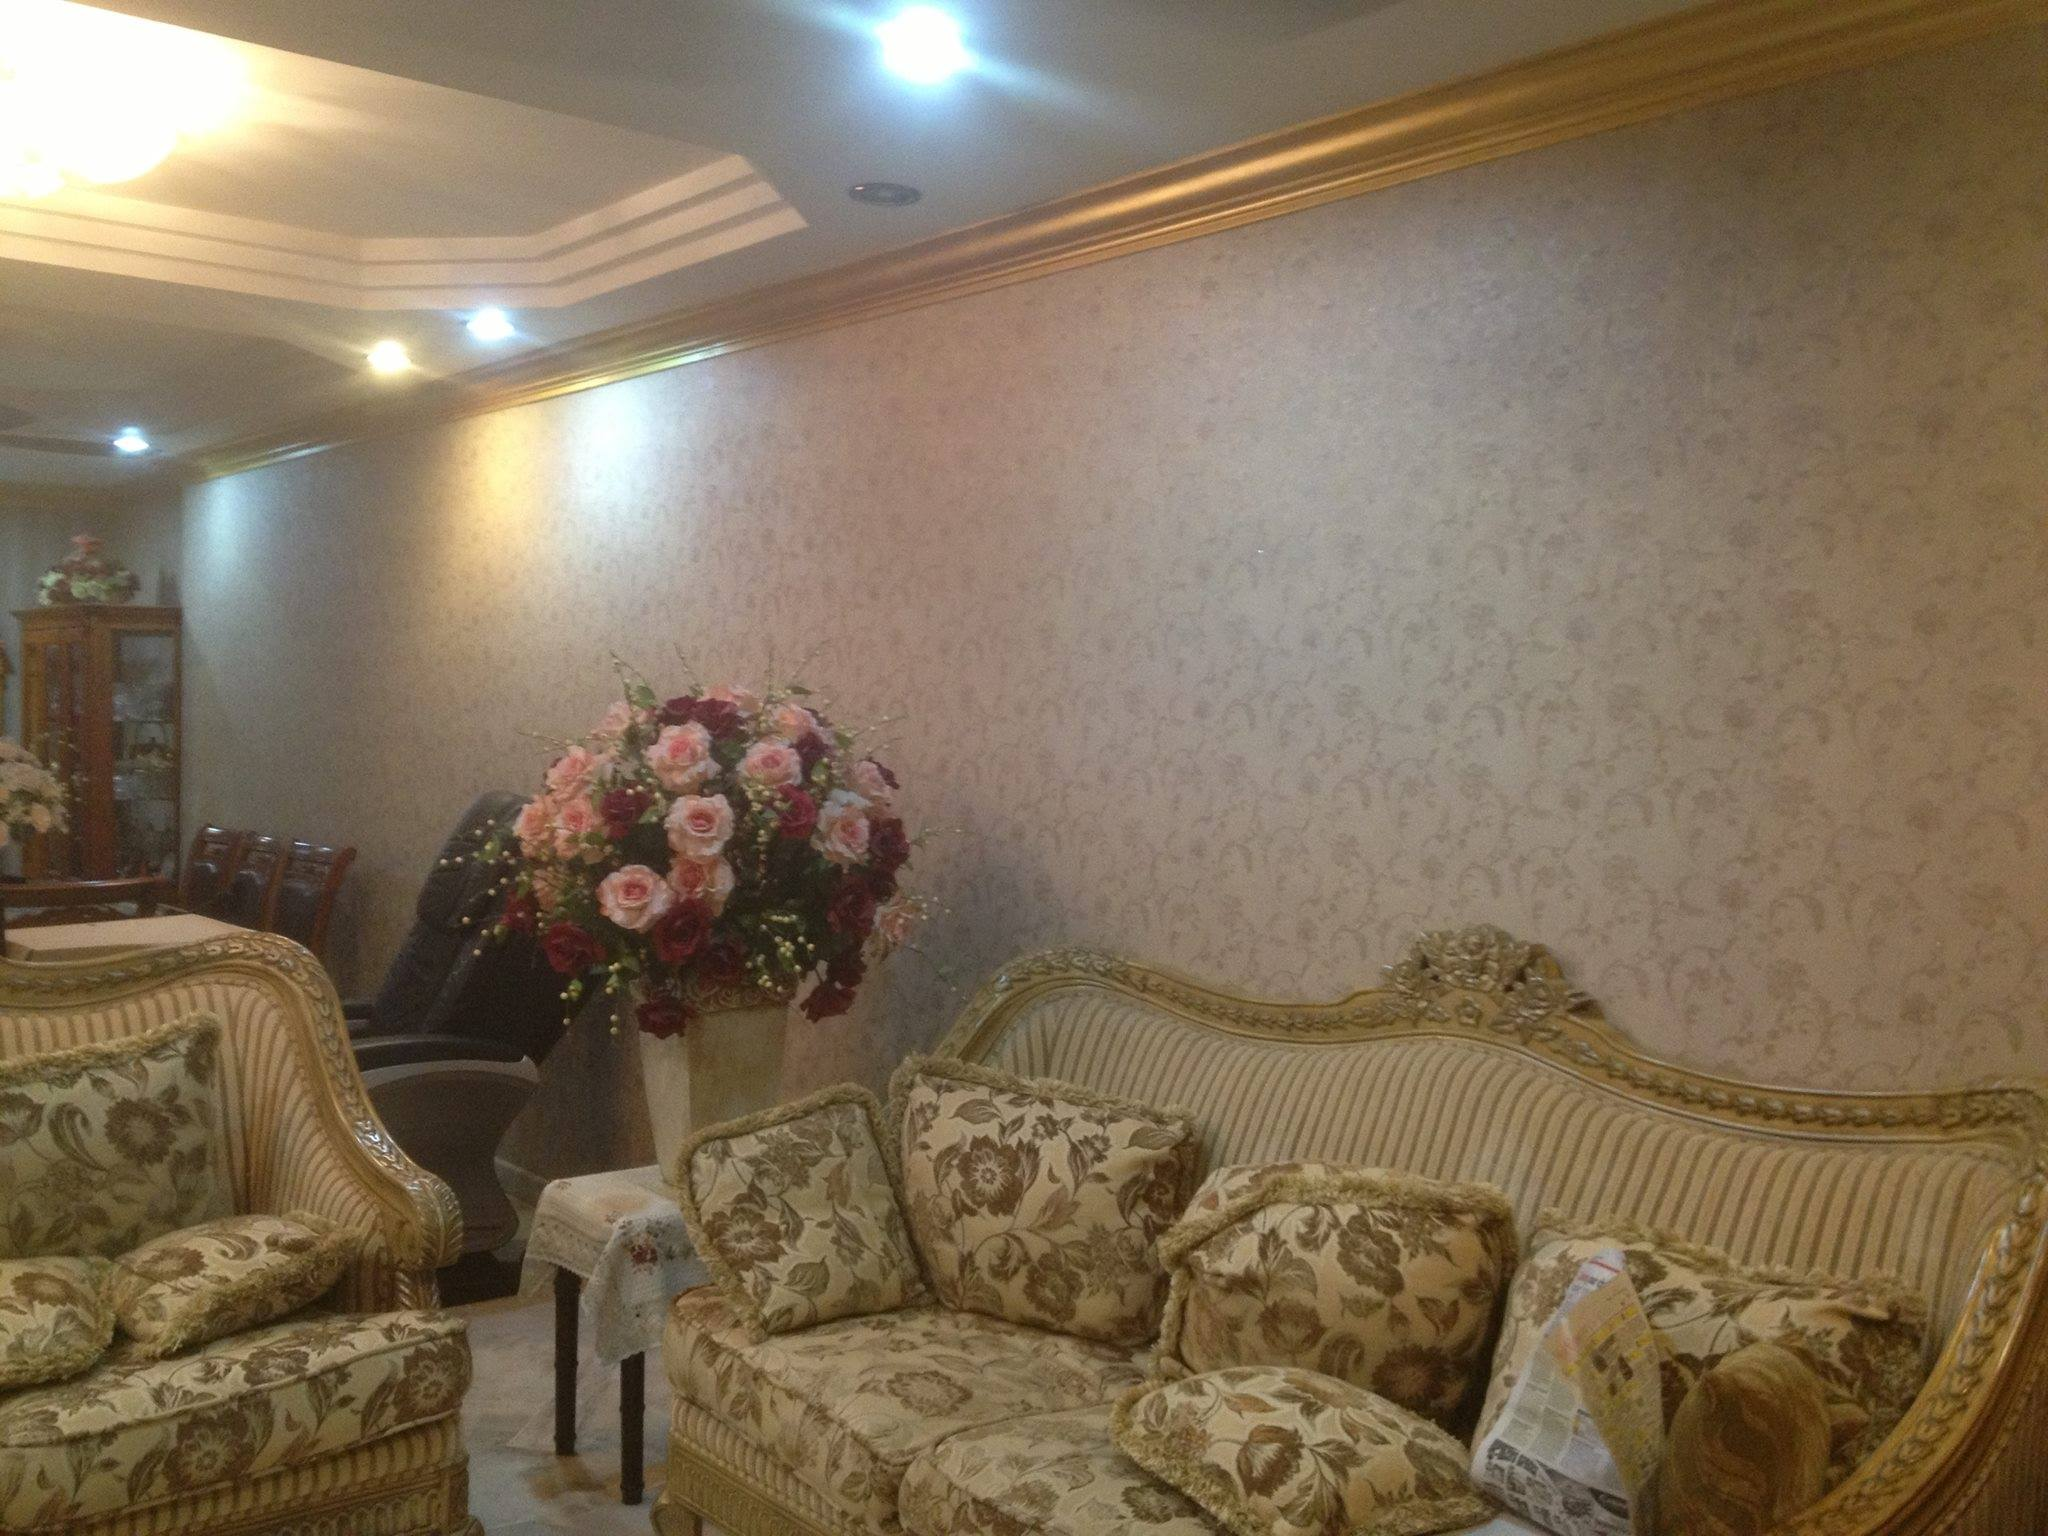 Mekar deko design renof find a professional Home mekar